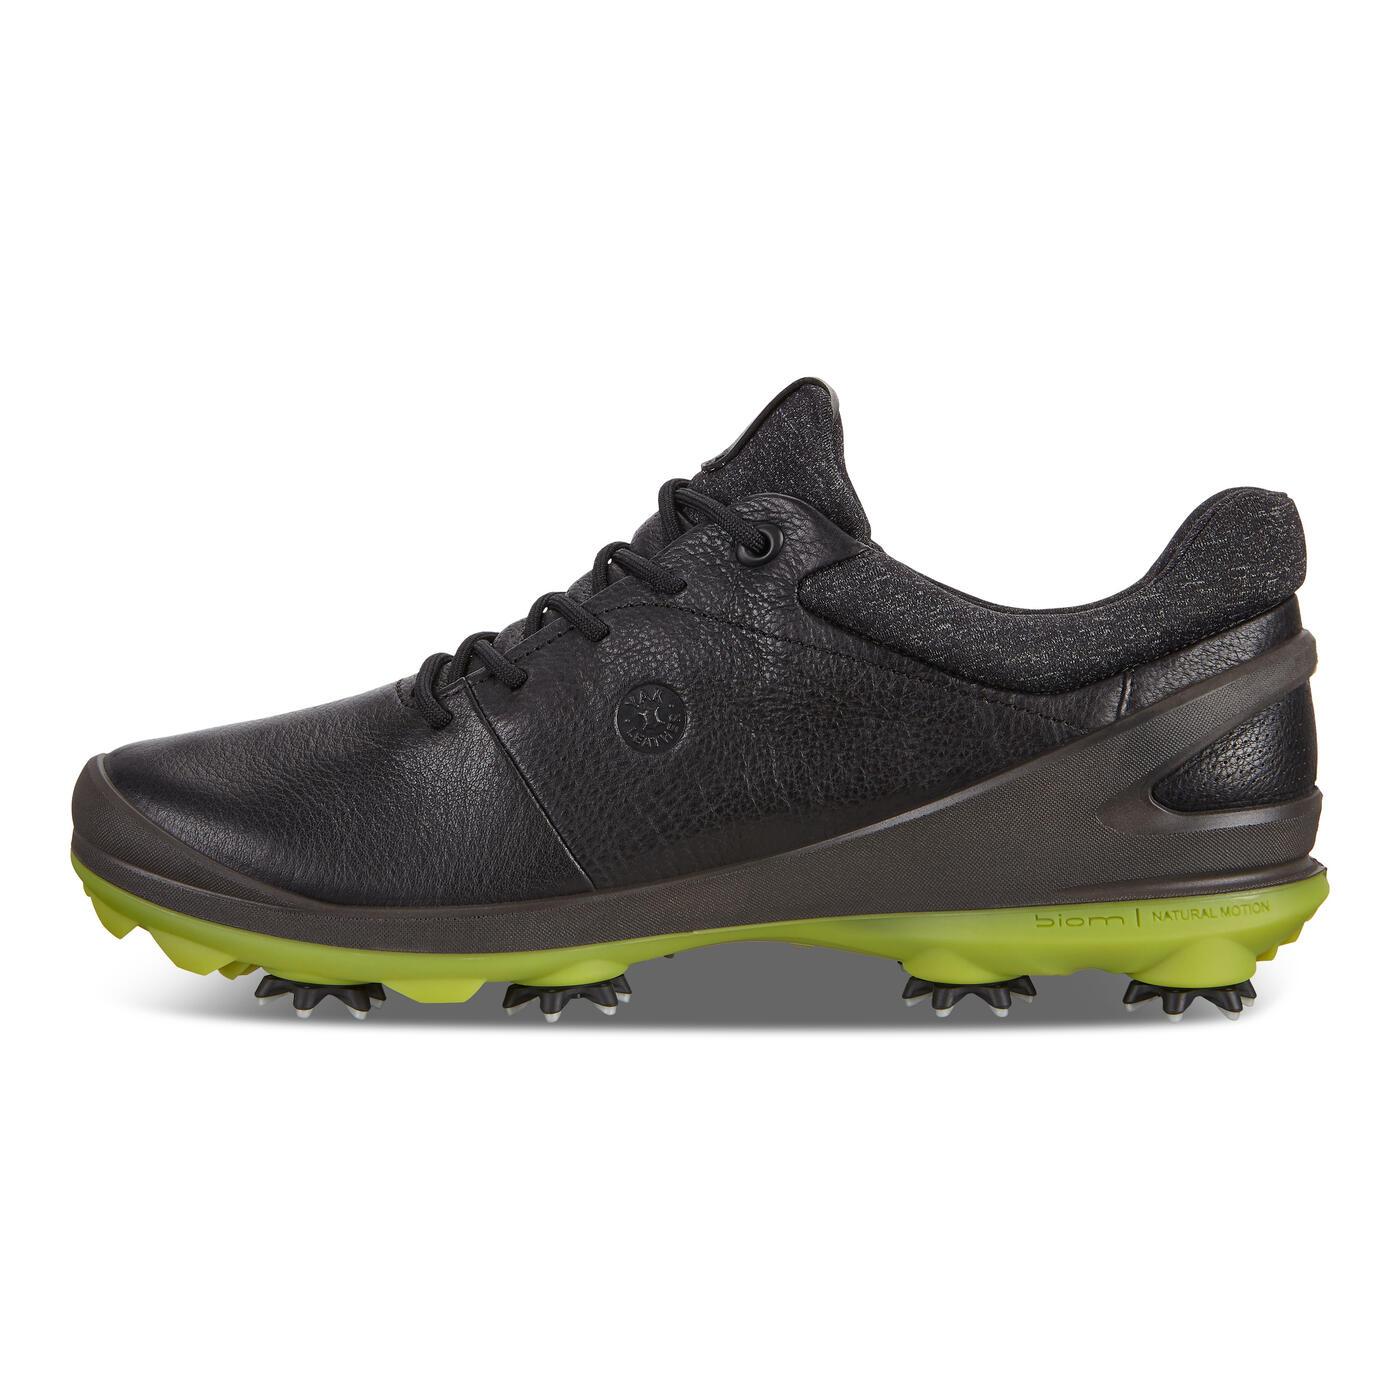 ECCO MEN'S GOLF BIOM G 3 Golf Shoe